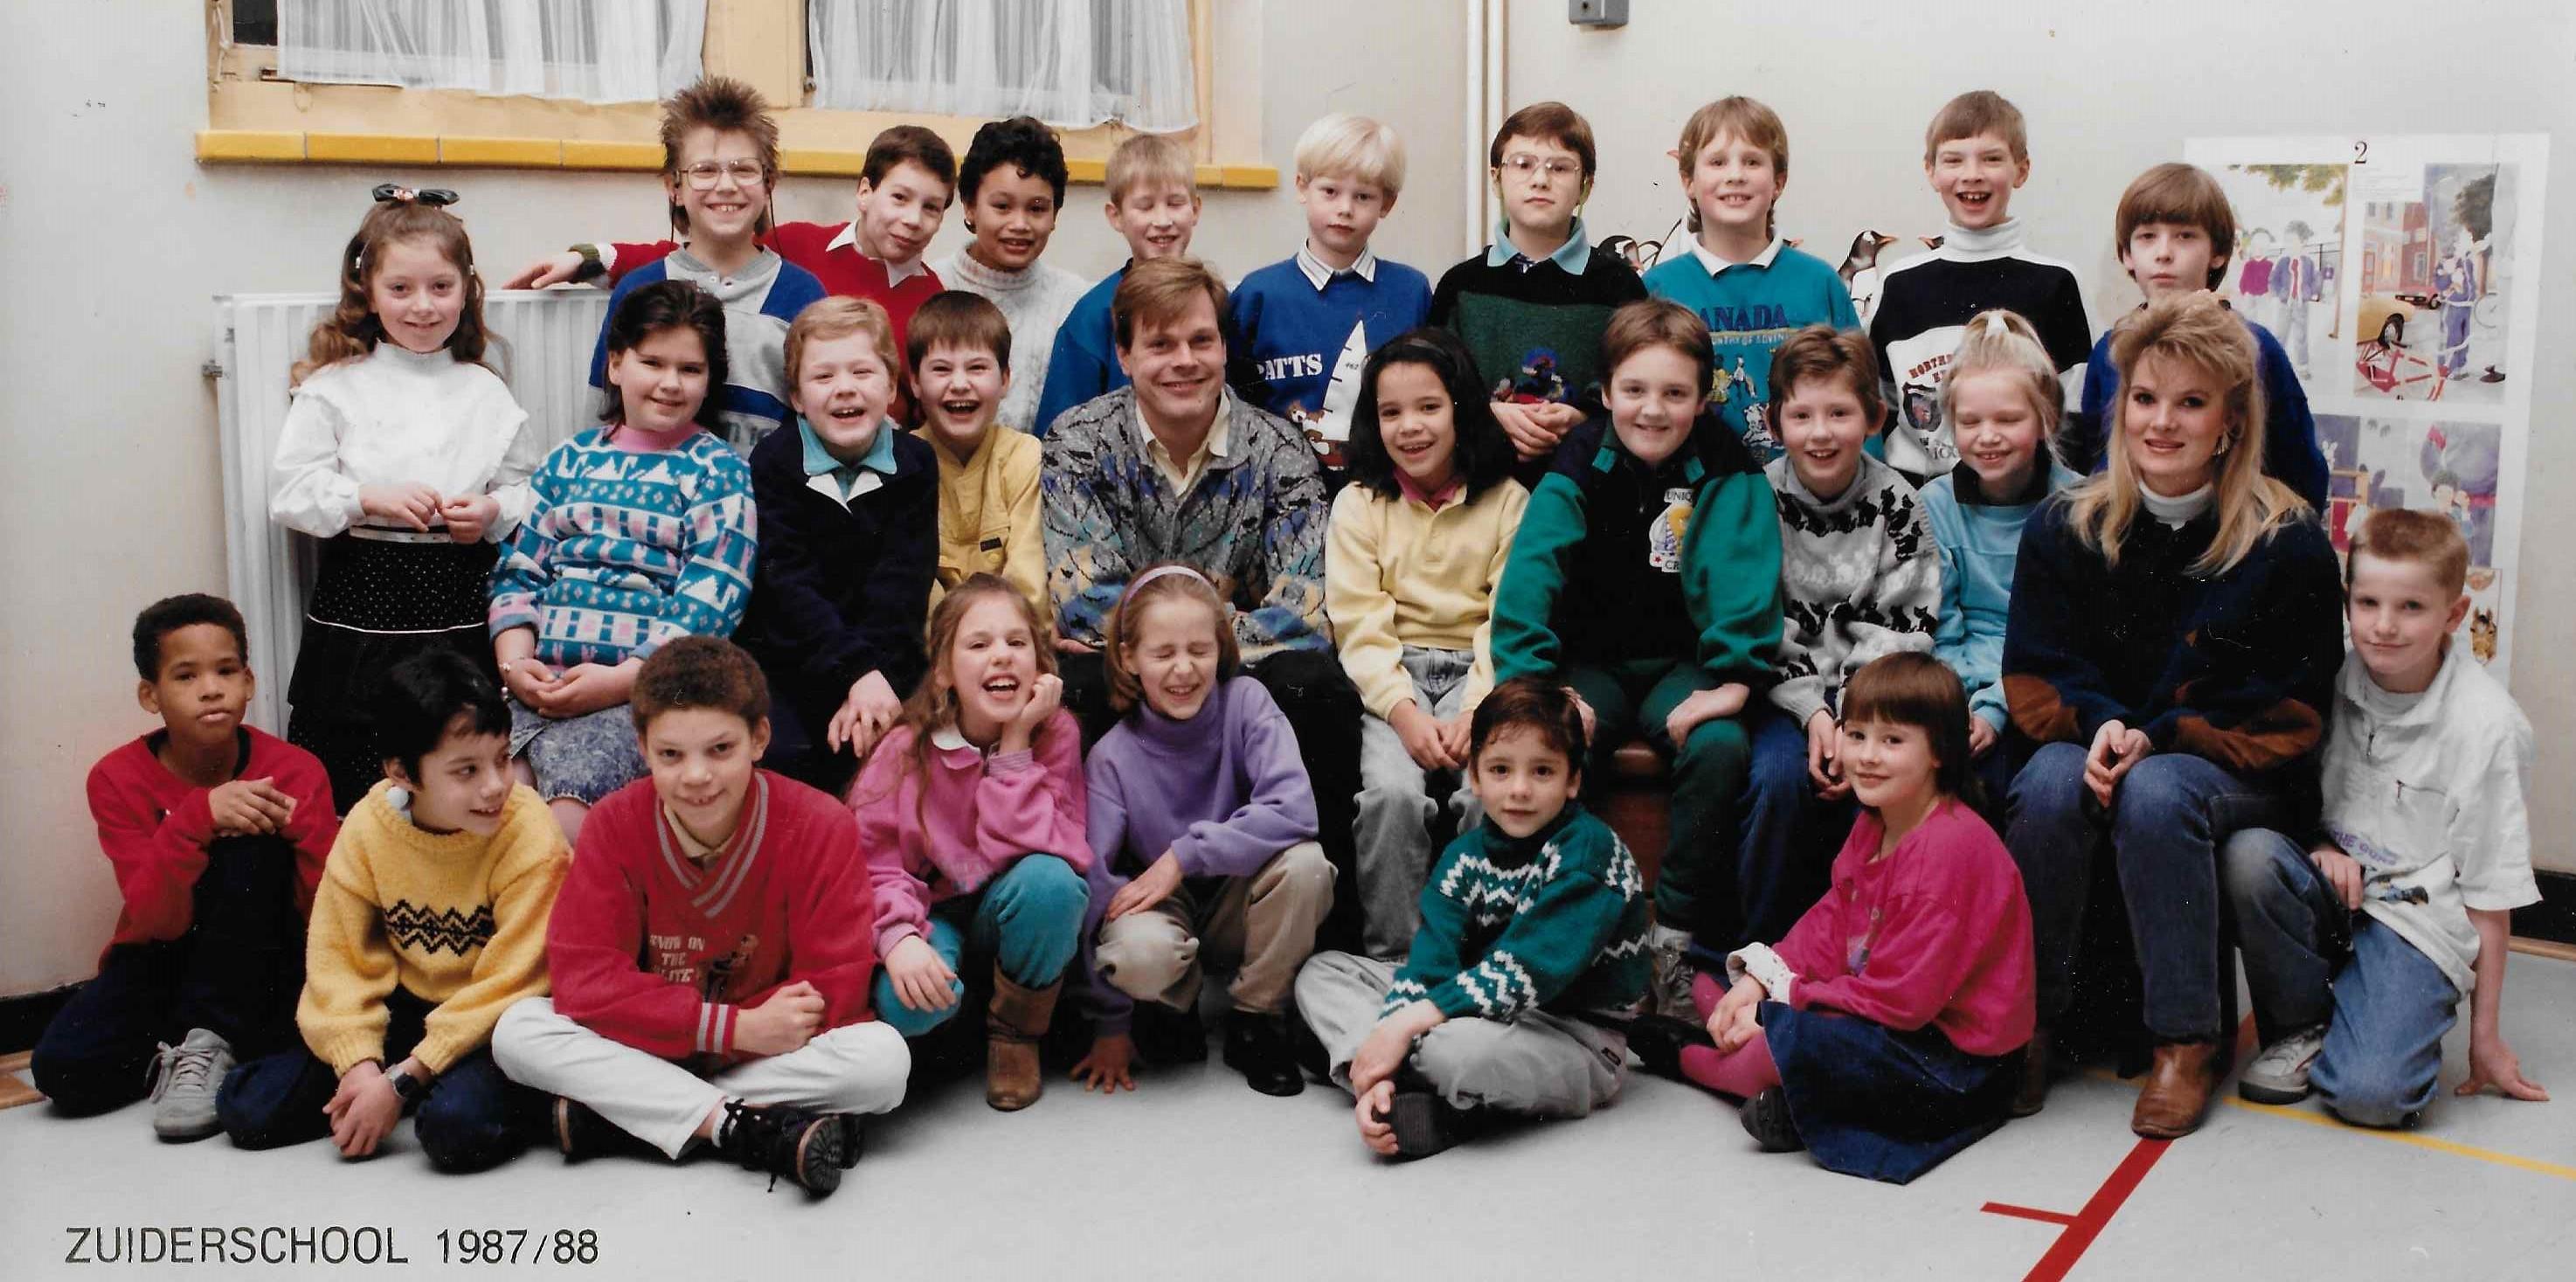 Zuiderschool foto